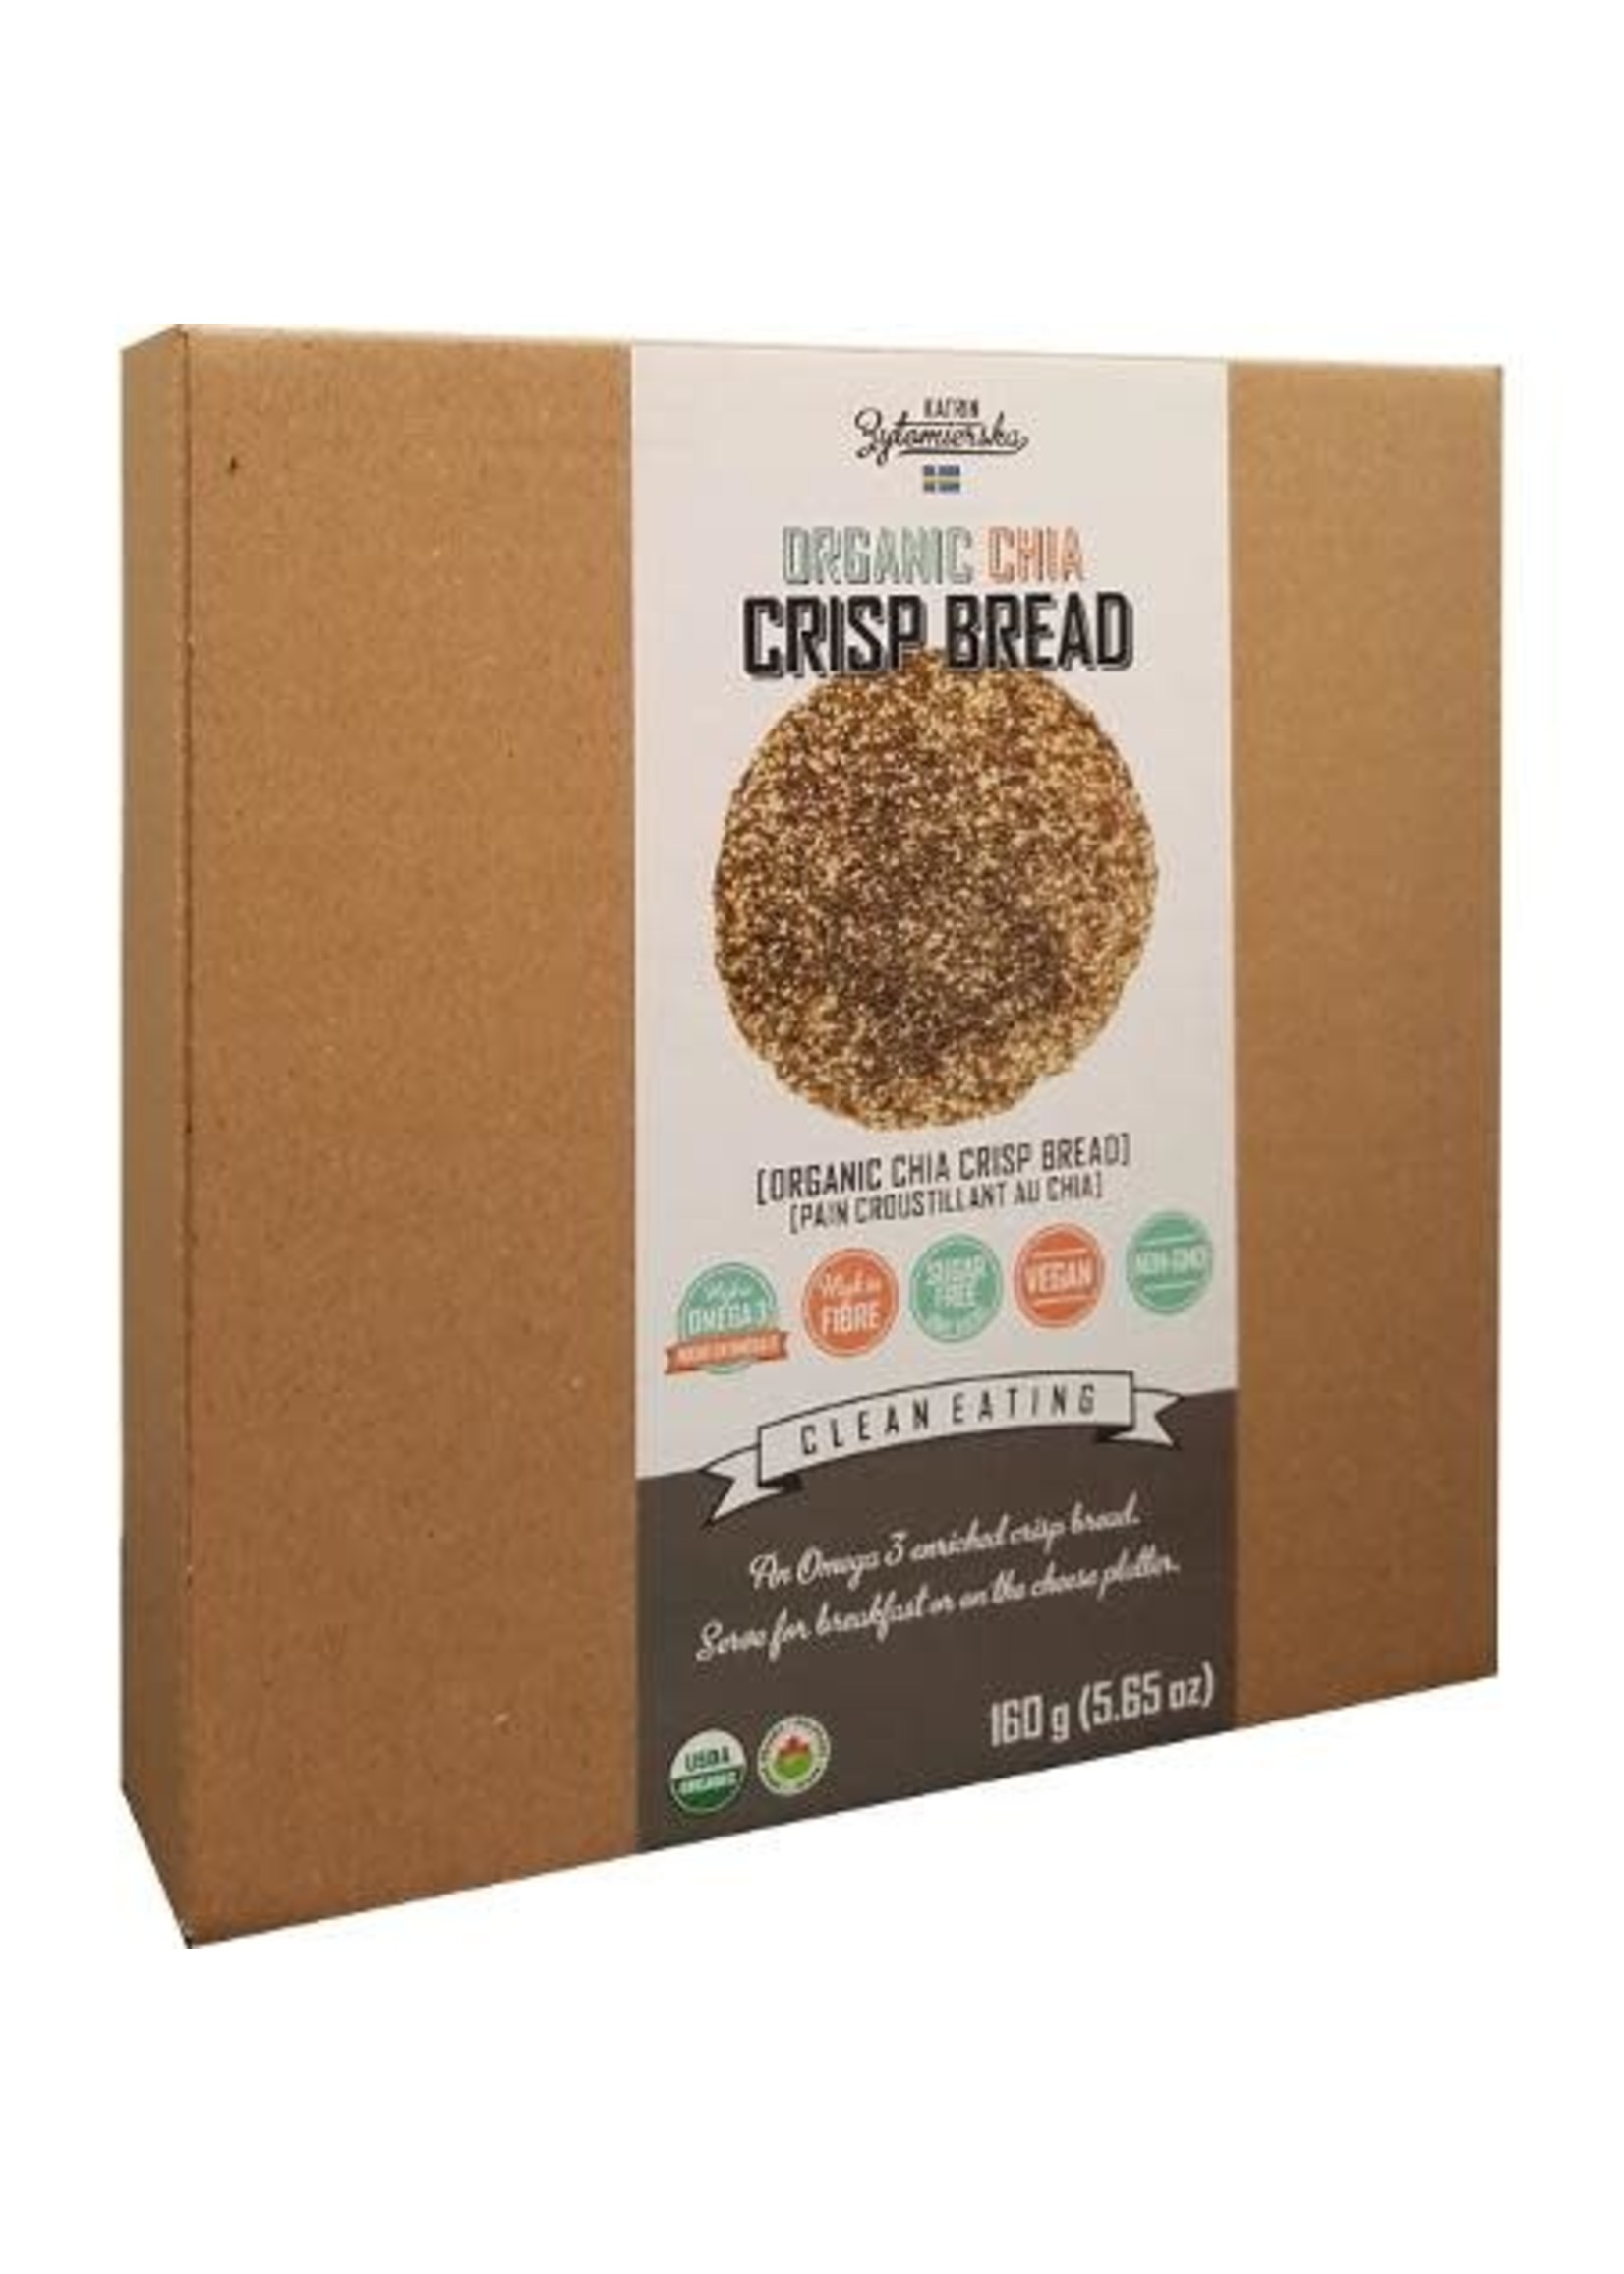 KZ Clean Eating Organic Chia Crisp Bread